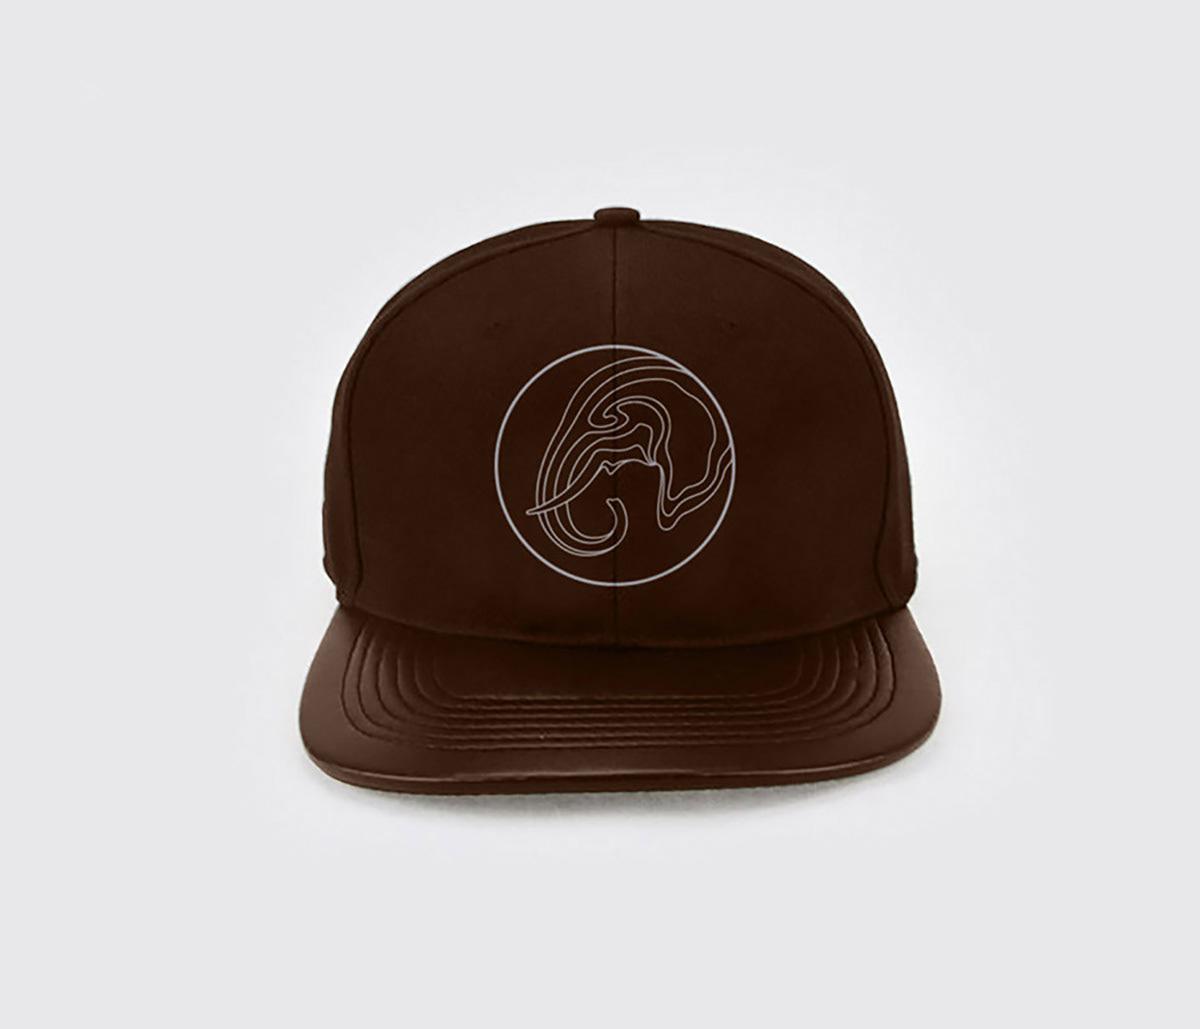 brand identity logo superfried elephants charity leonardo dicaprio leonardo dicaprio foundation elephant crisis fund ILLUSTRATION  contours